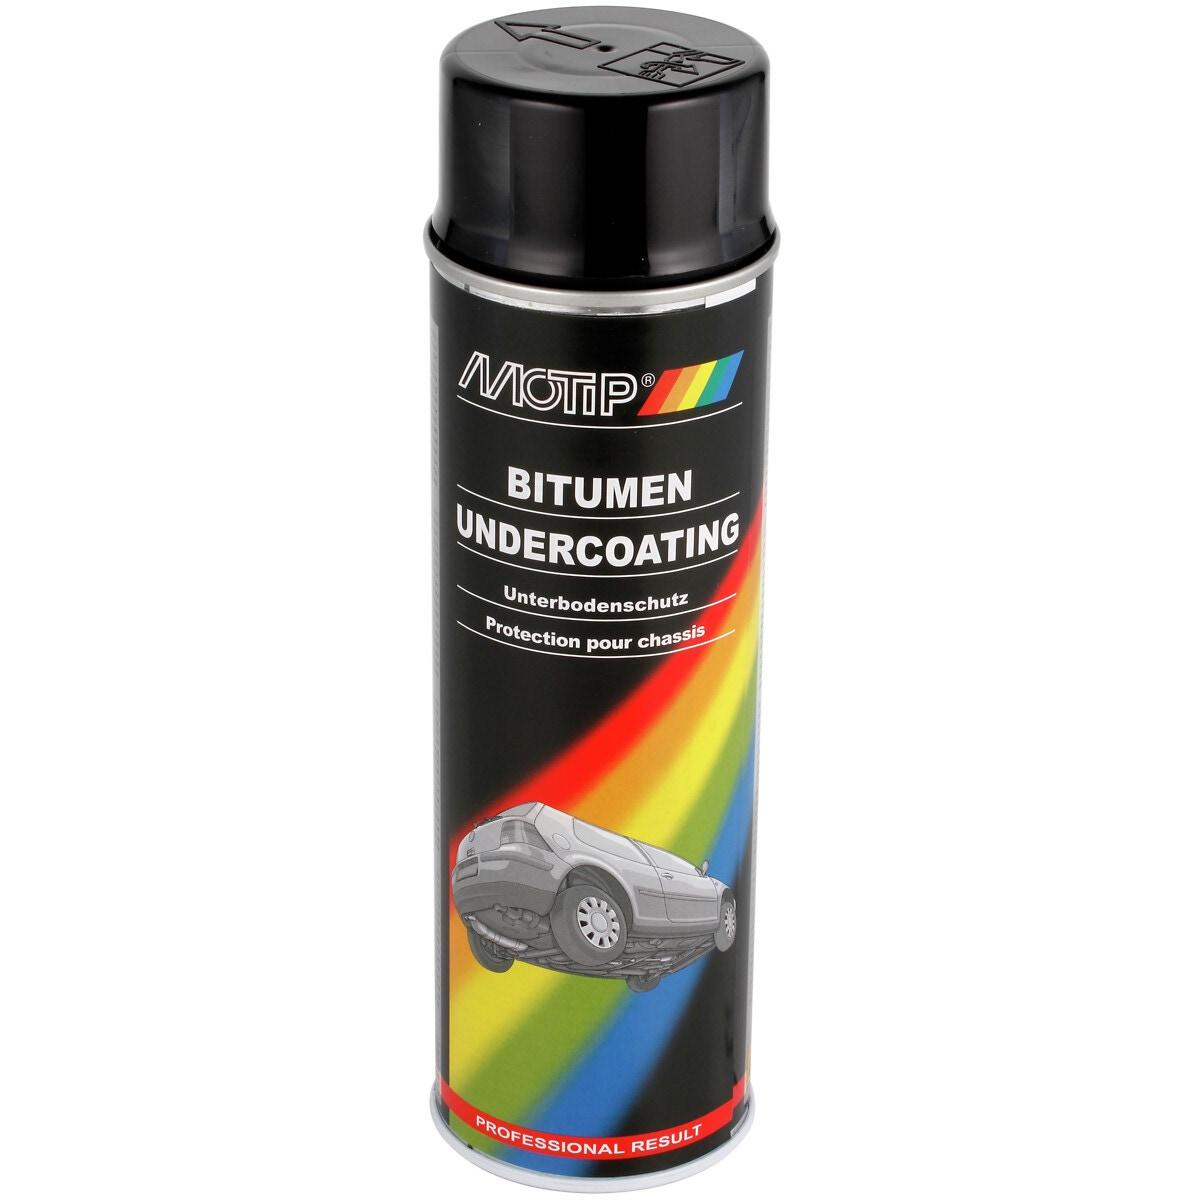 Huurtumisenesto spray